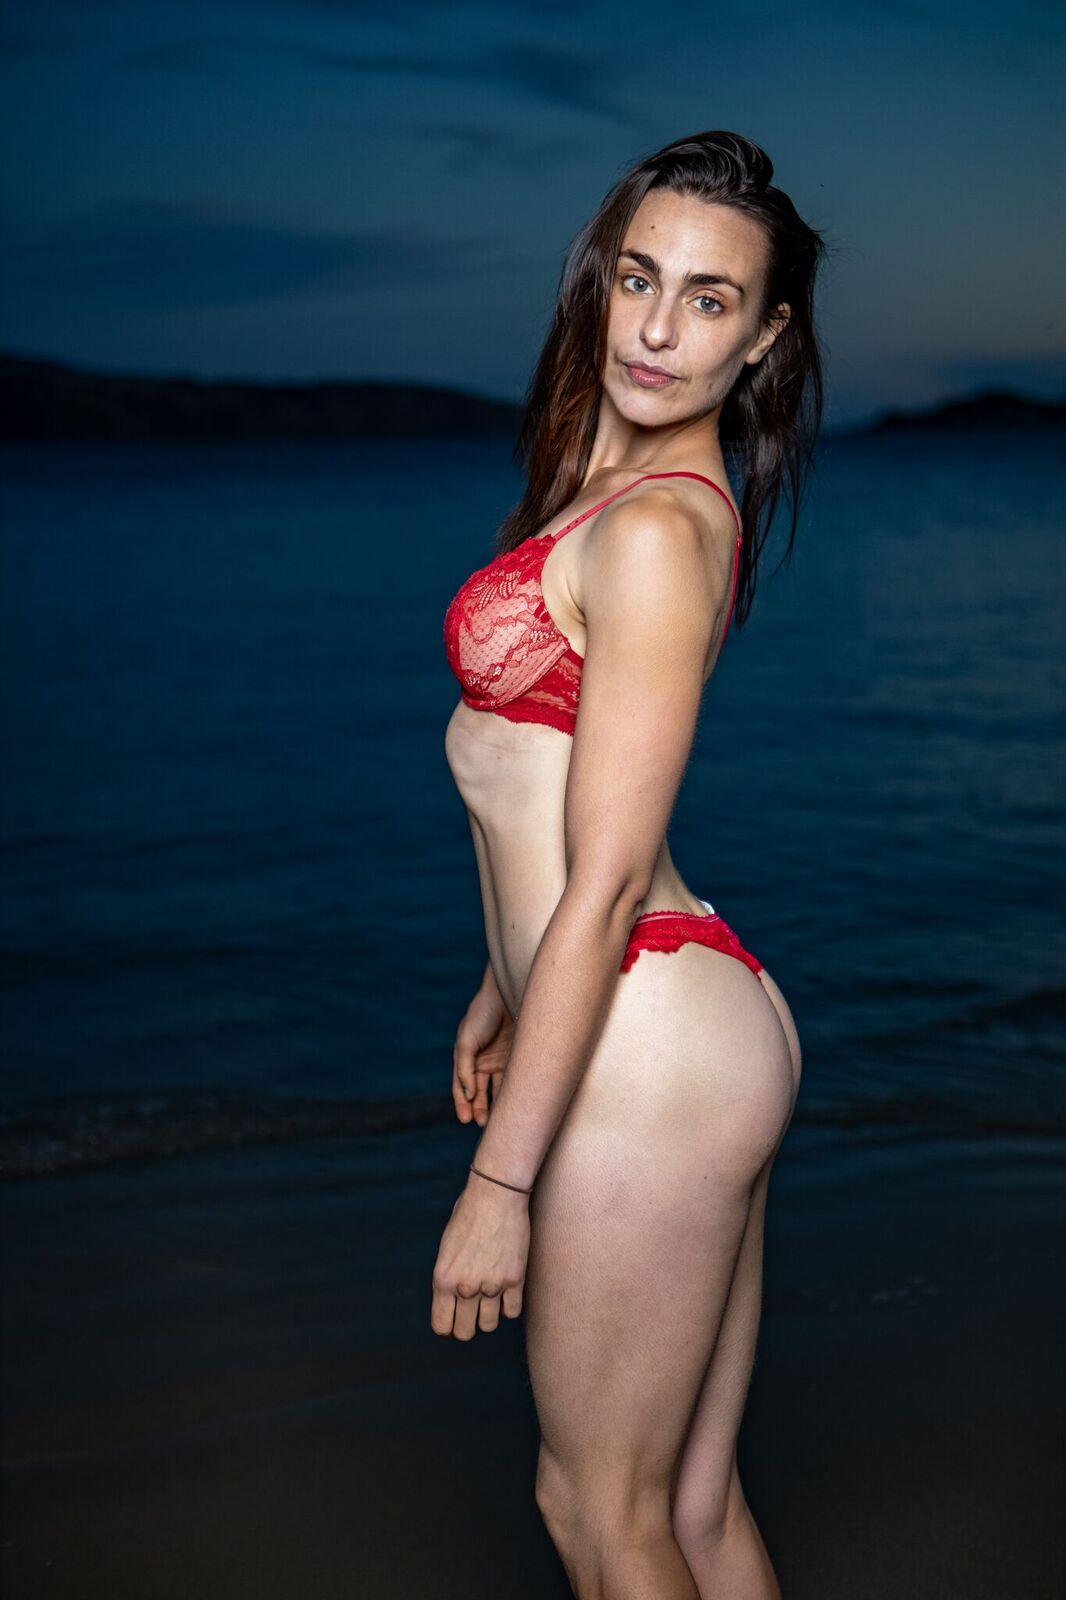 Island Bay Bikini Girls Wellington Strippers